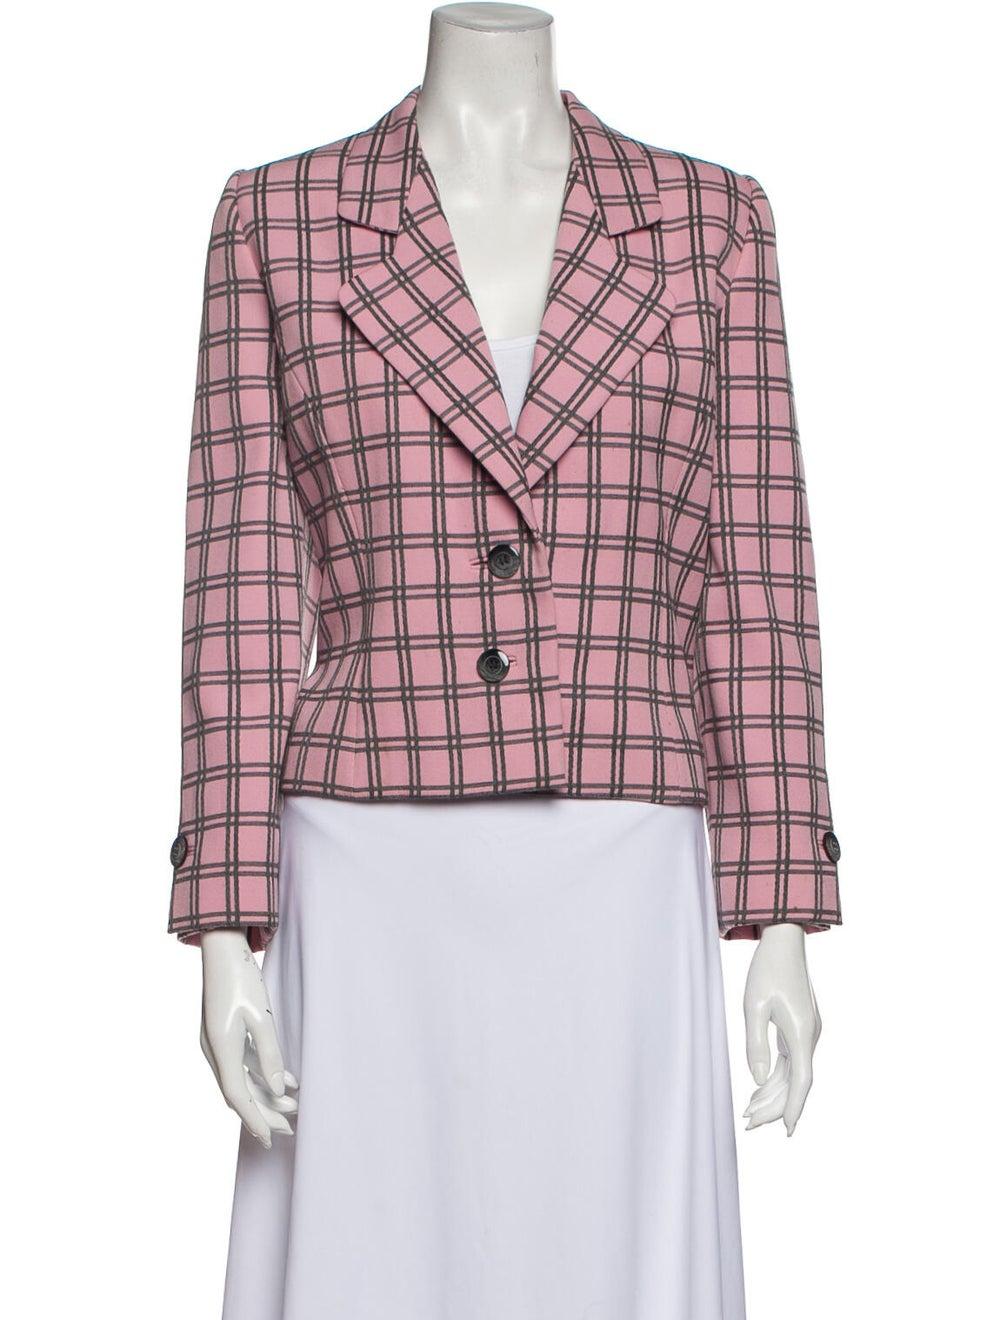 Galanos Vintage Grid Blazer Pink - image 1